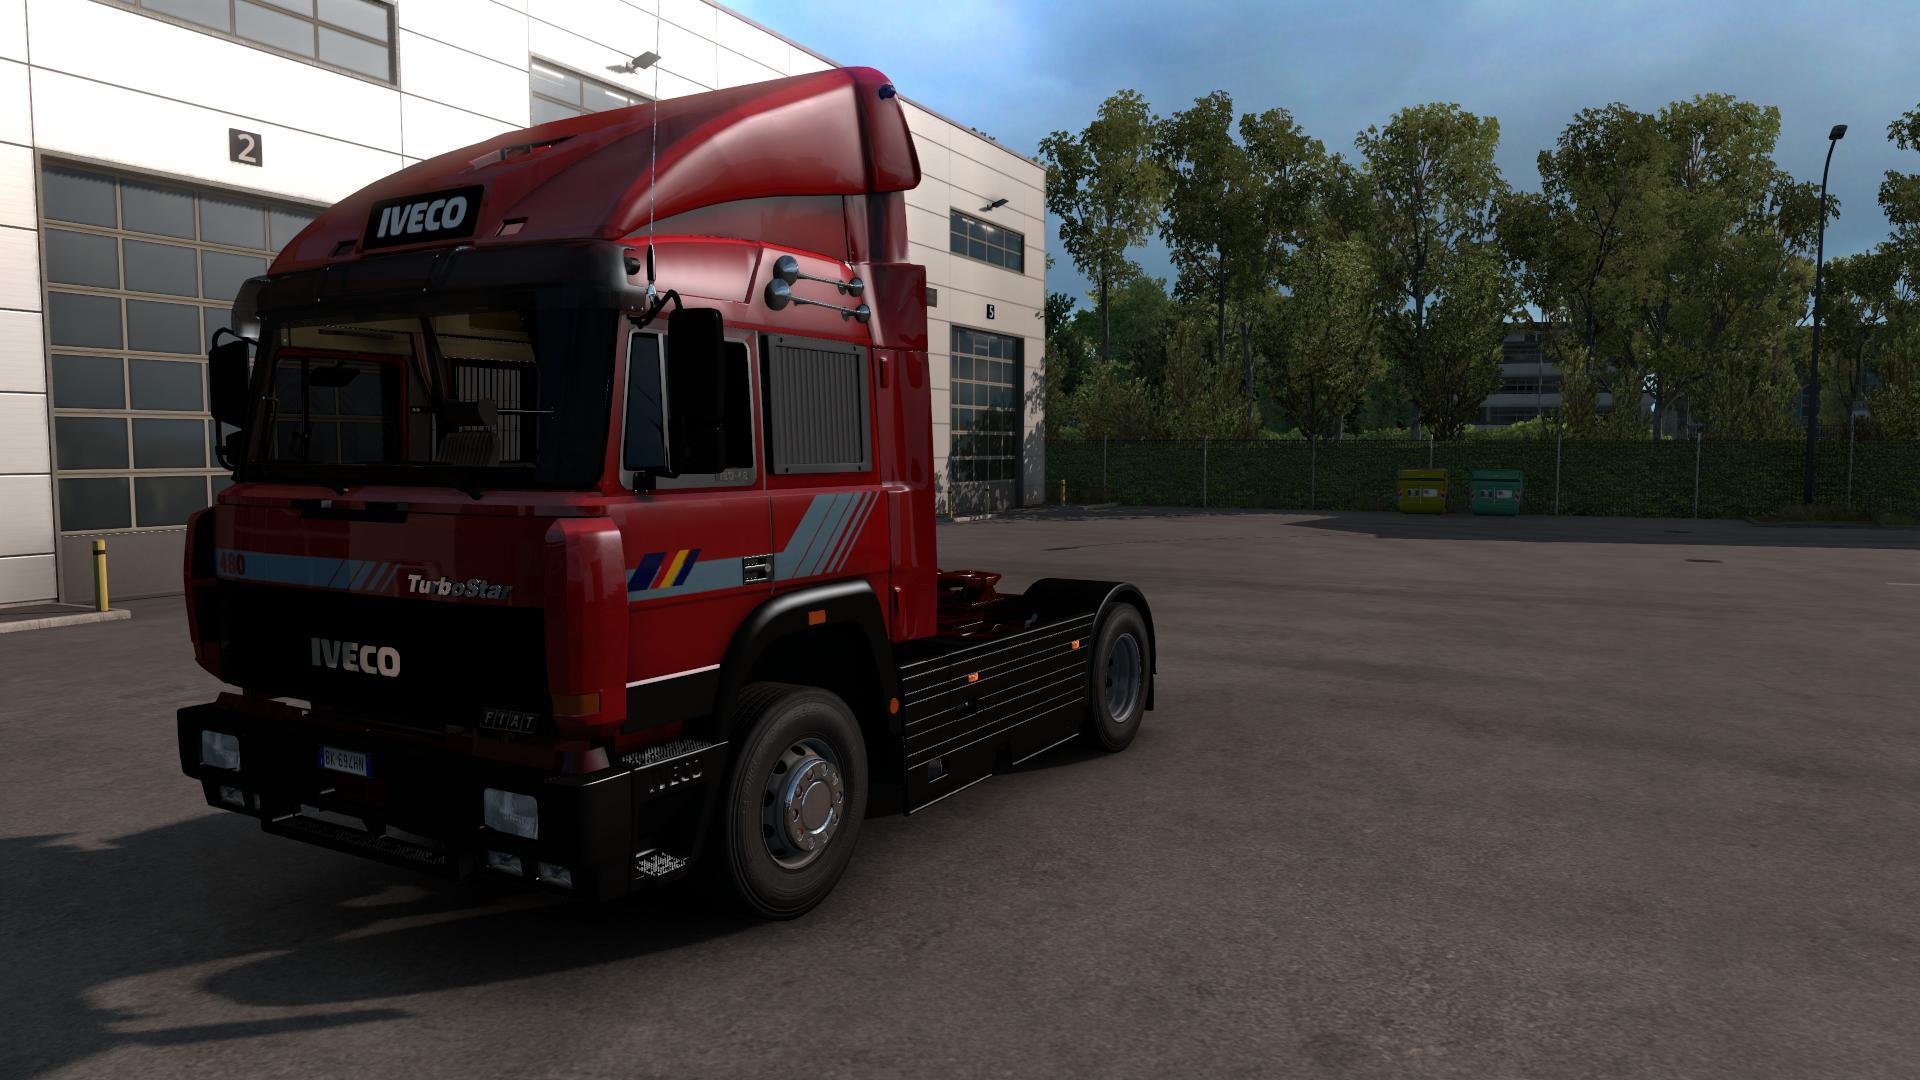 ETS2 - Iveco Turbostar Truck (1.38.x)